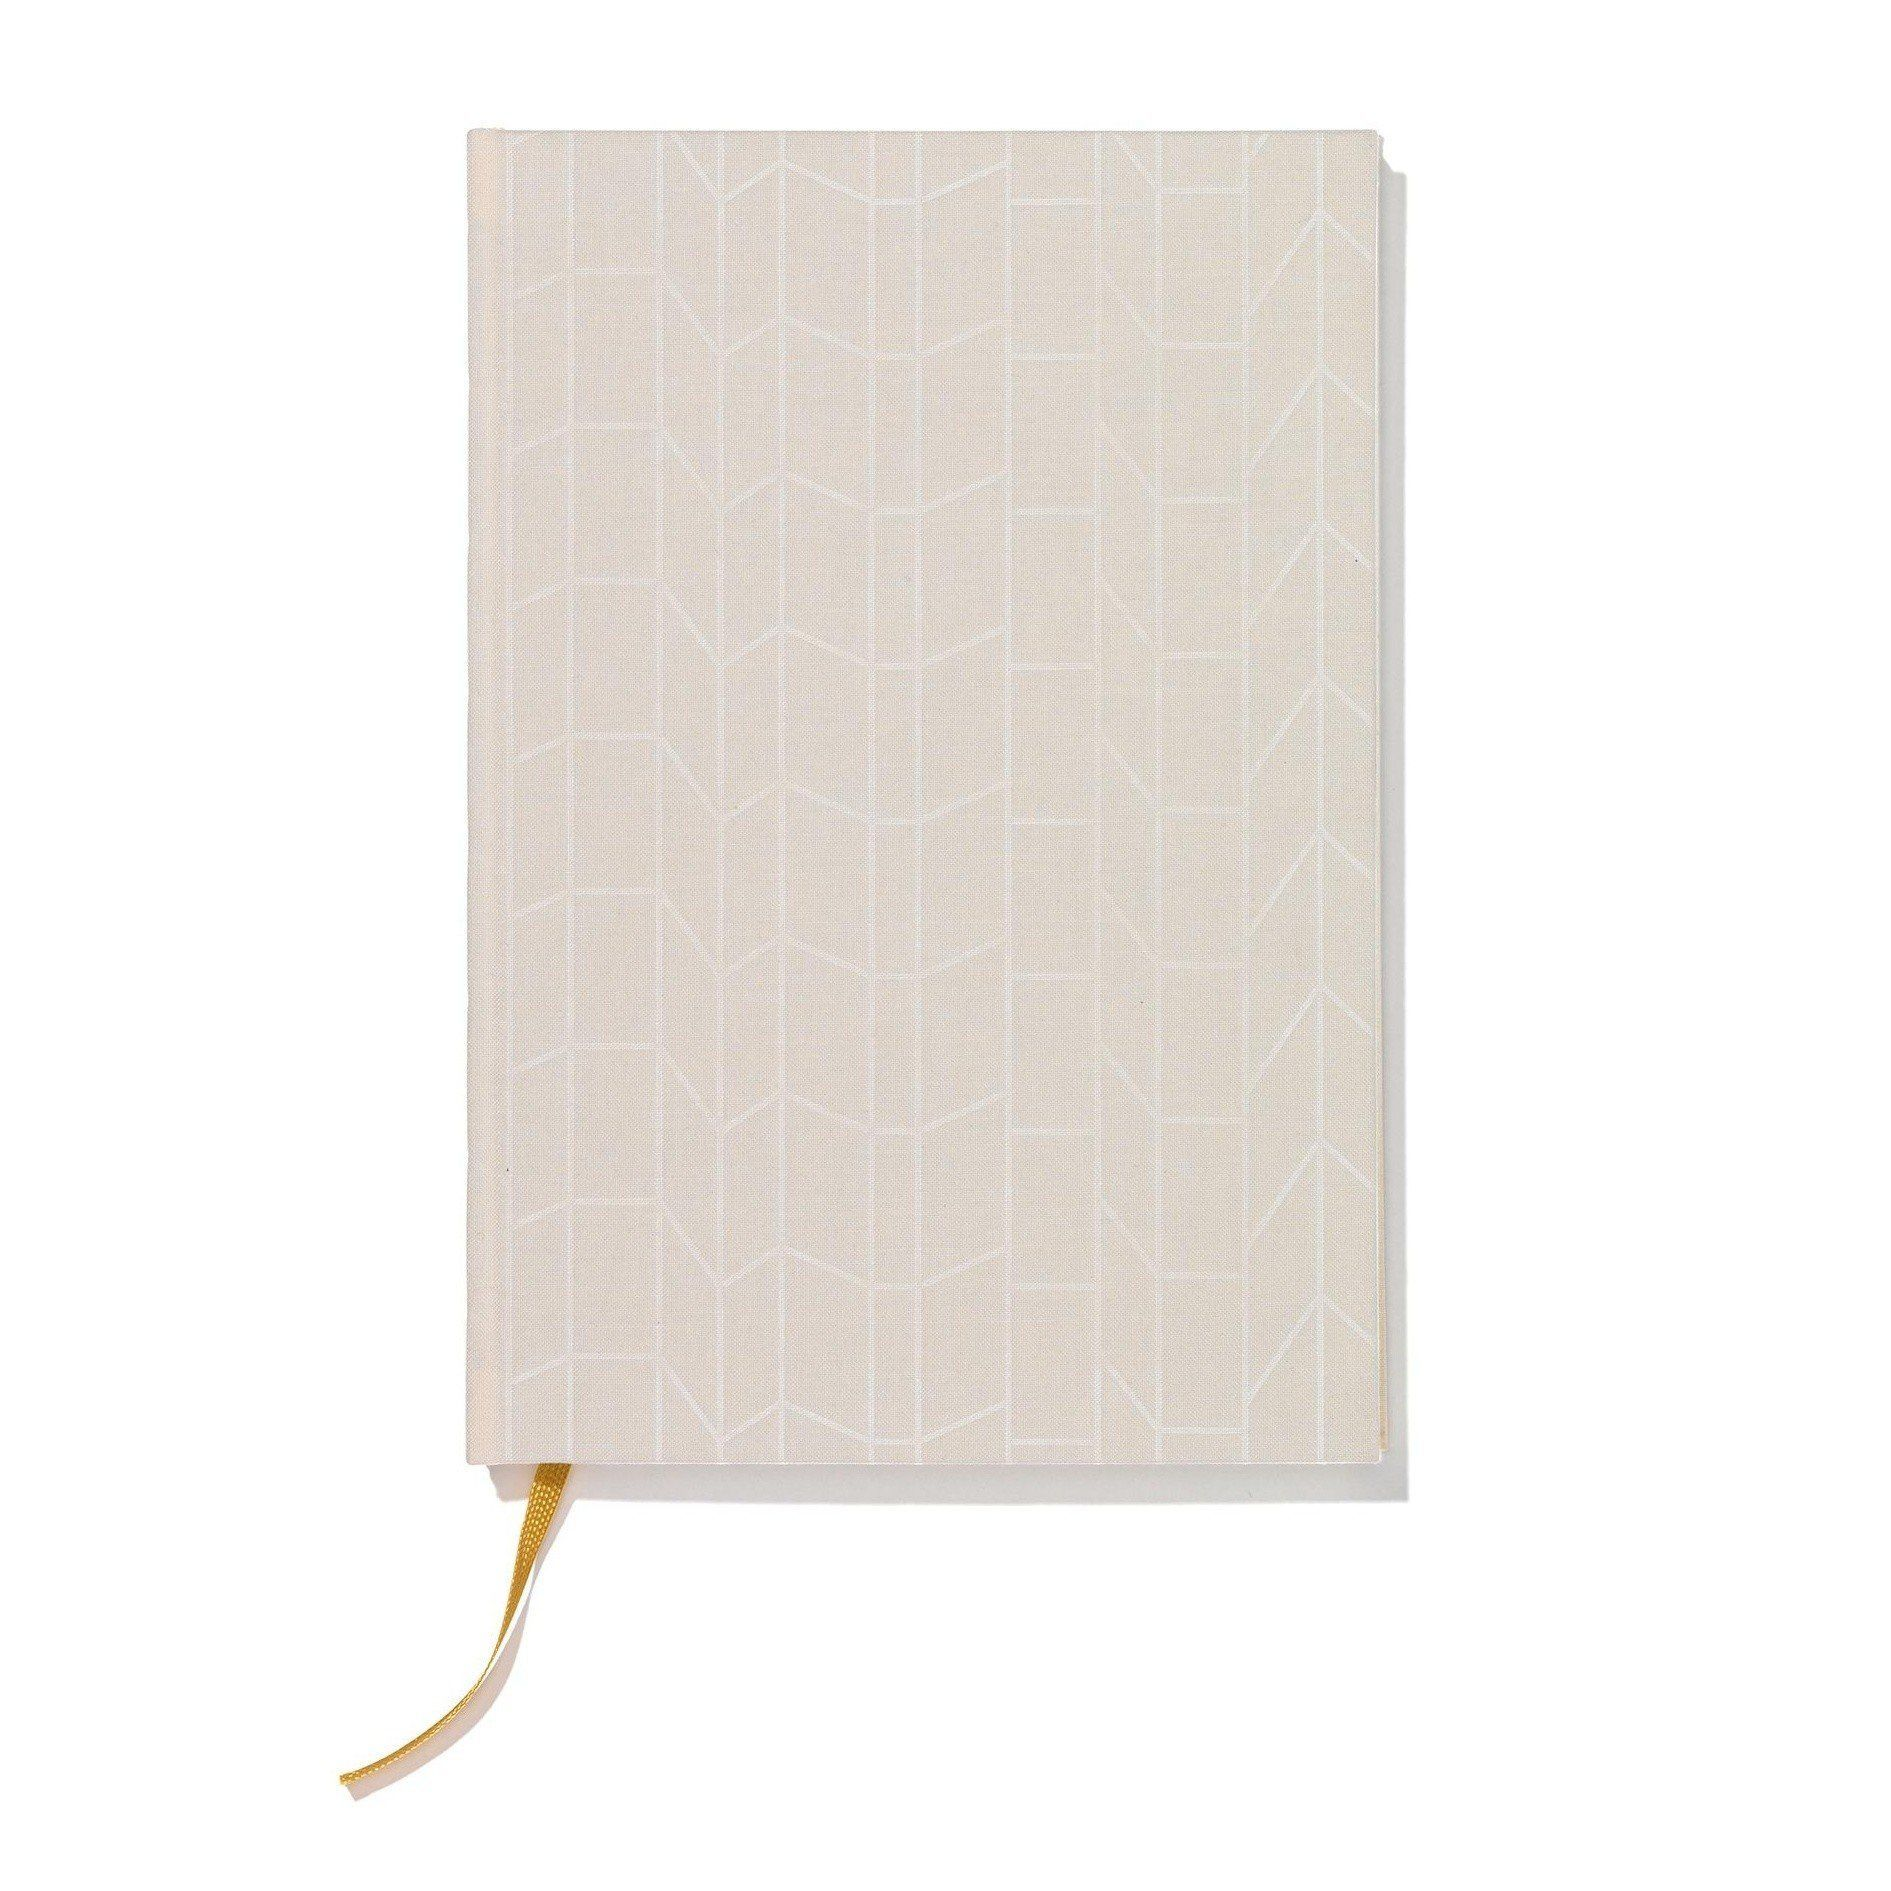 Vitra Notebook Hardcover A5 Notizbuch | Vitra | AmbienteDirect.com